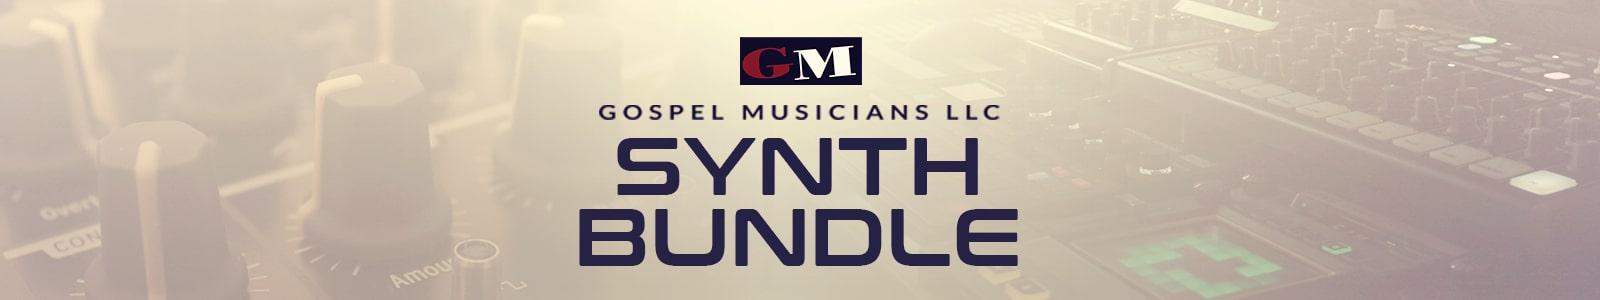 gospel musicians synth bundle